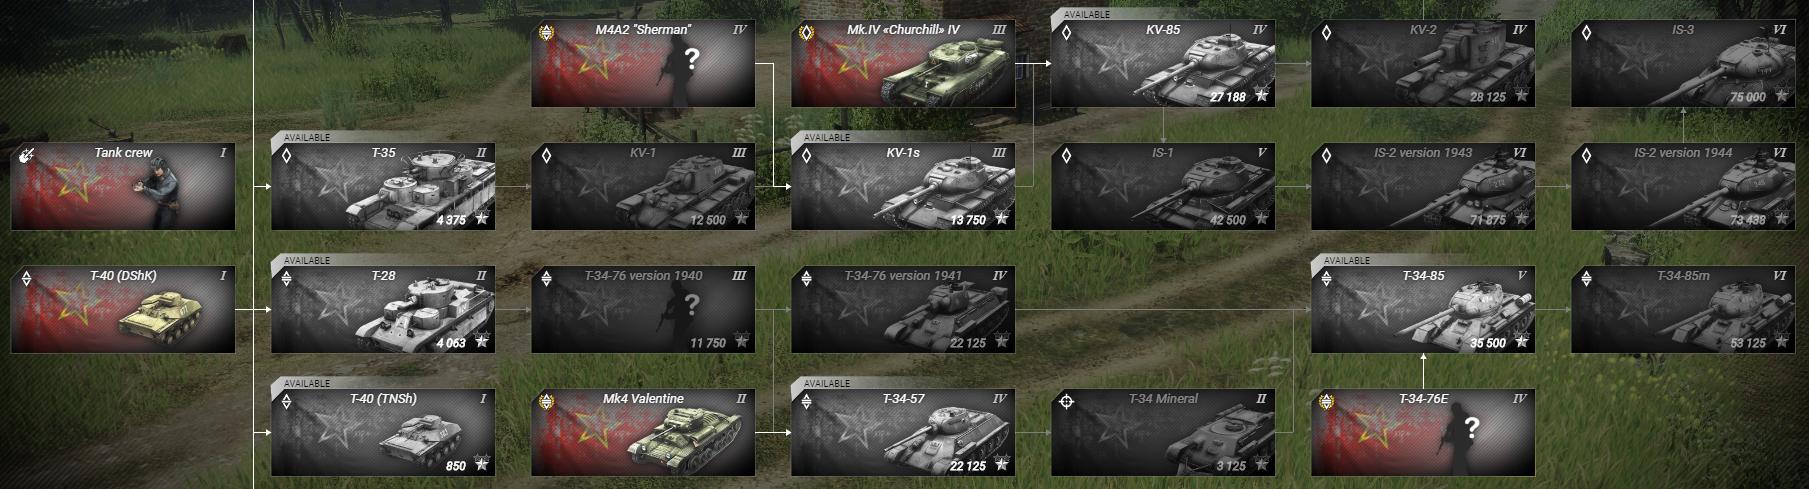 Ветка развития - Soldiers: Arena